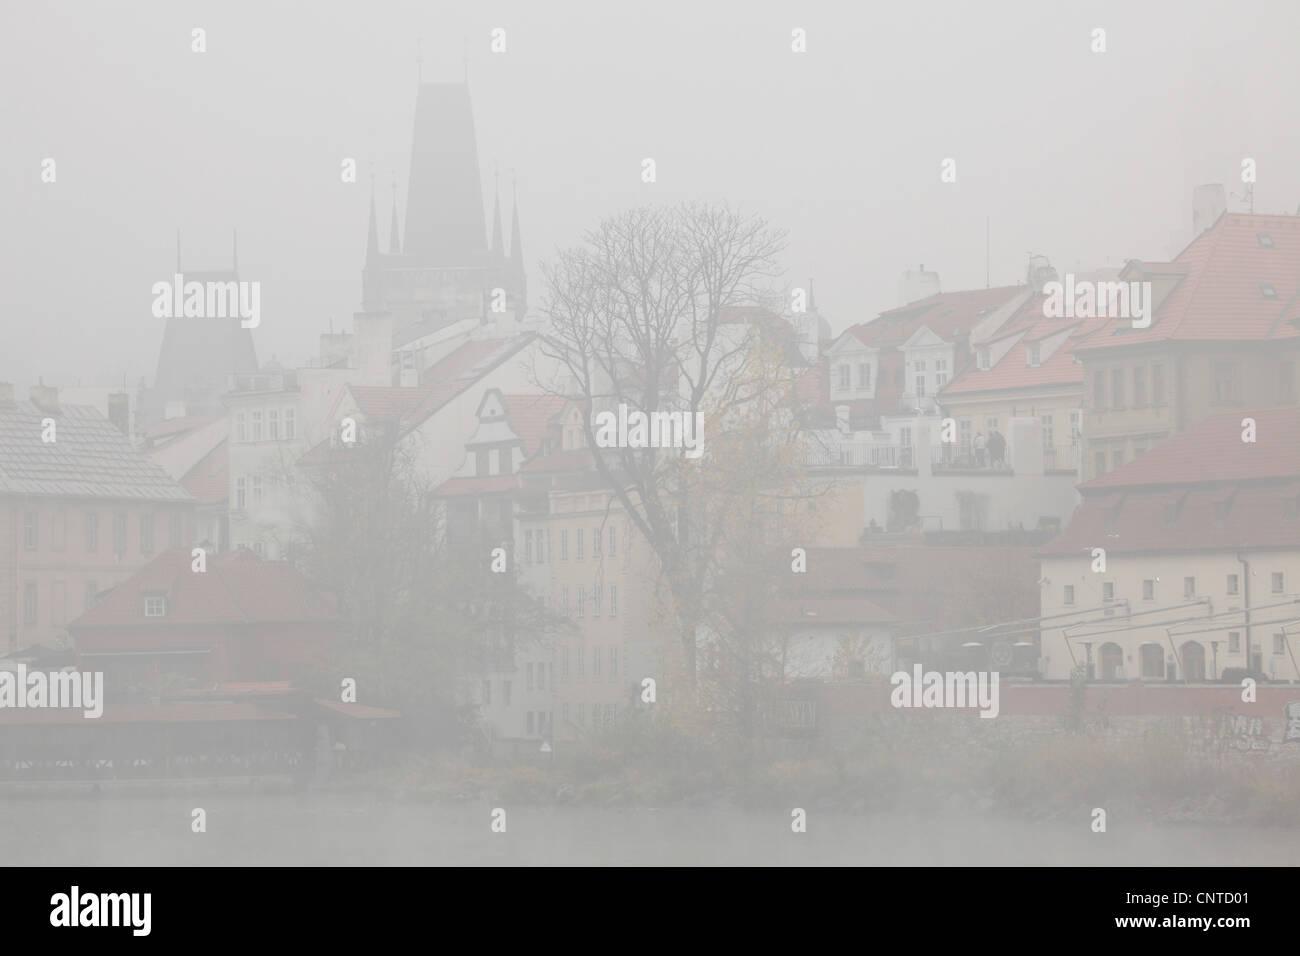 Morning fog over the Vltava River in Prague, Czech Republic. Mala Strana Bridge Towers are seen in the background. - Stock Image